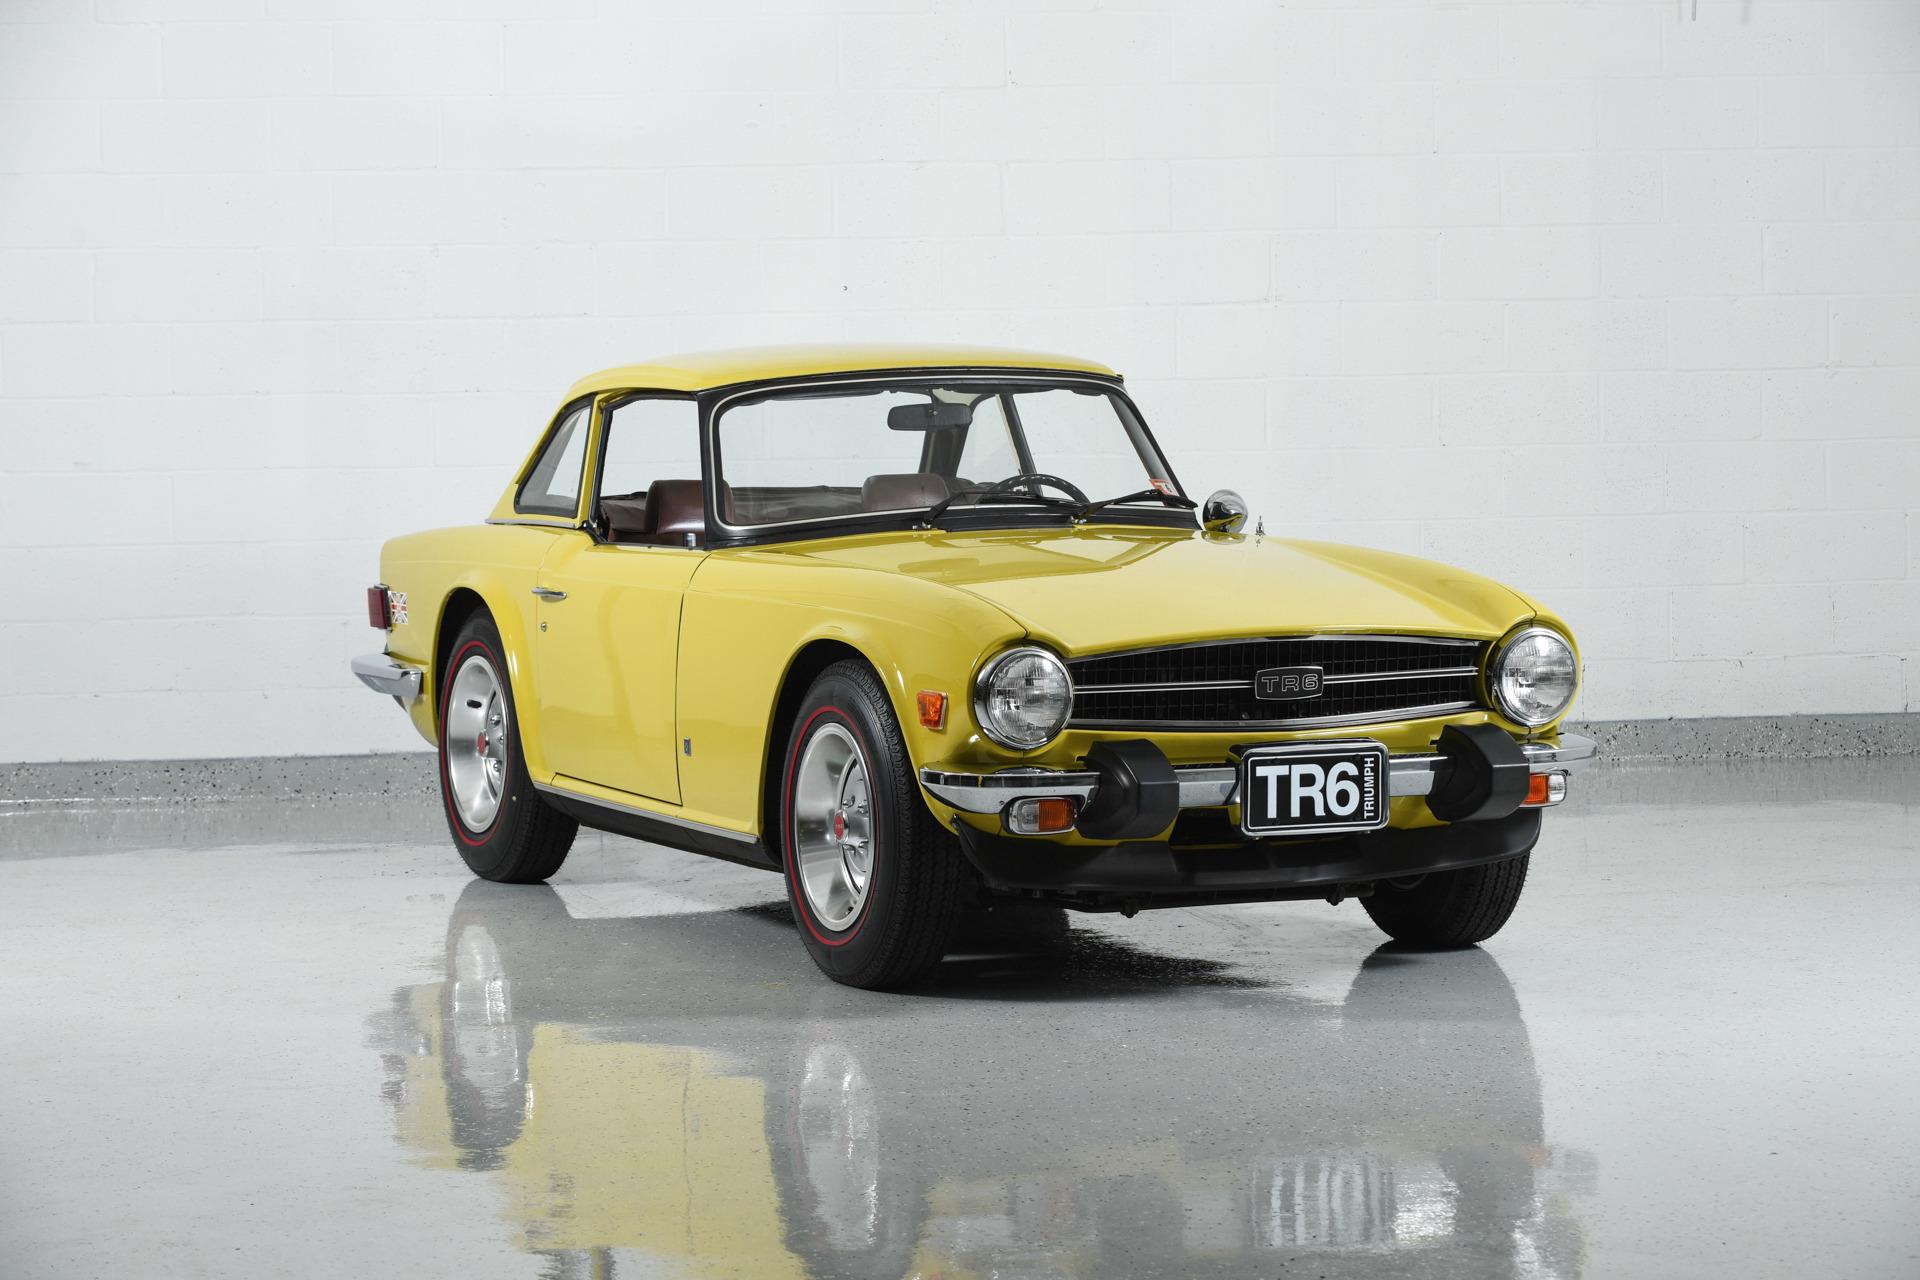 Used 1975 Triumph TR6 For Sale ($46,900)   Motorcar Classics